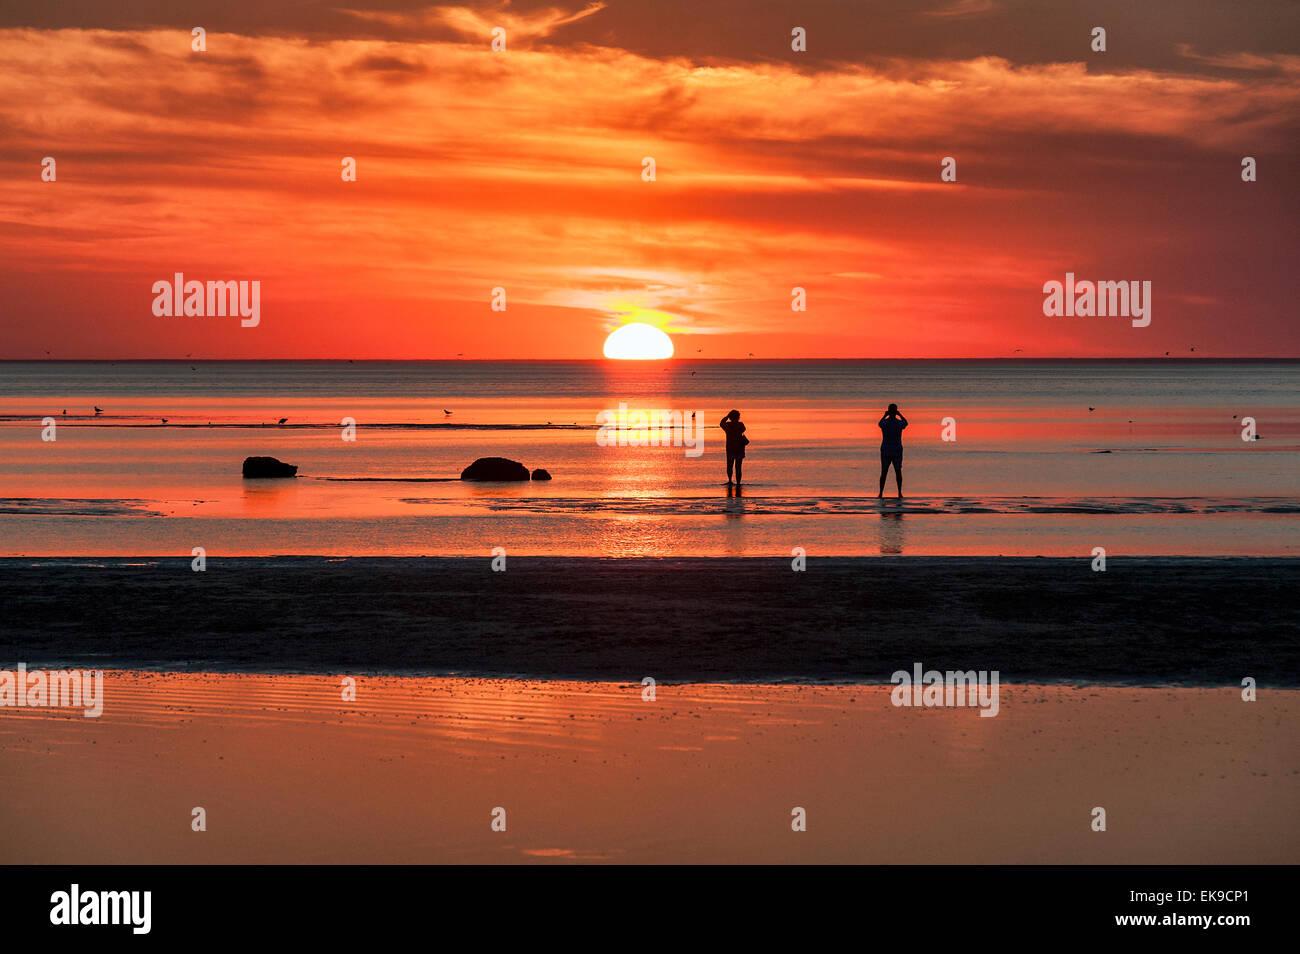 Photographers take sunset photos at Skaket beach, Cape Cod, Massachusetts, USA - Stock Image